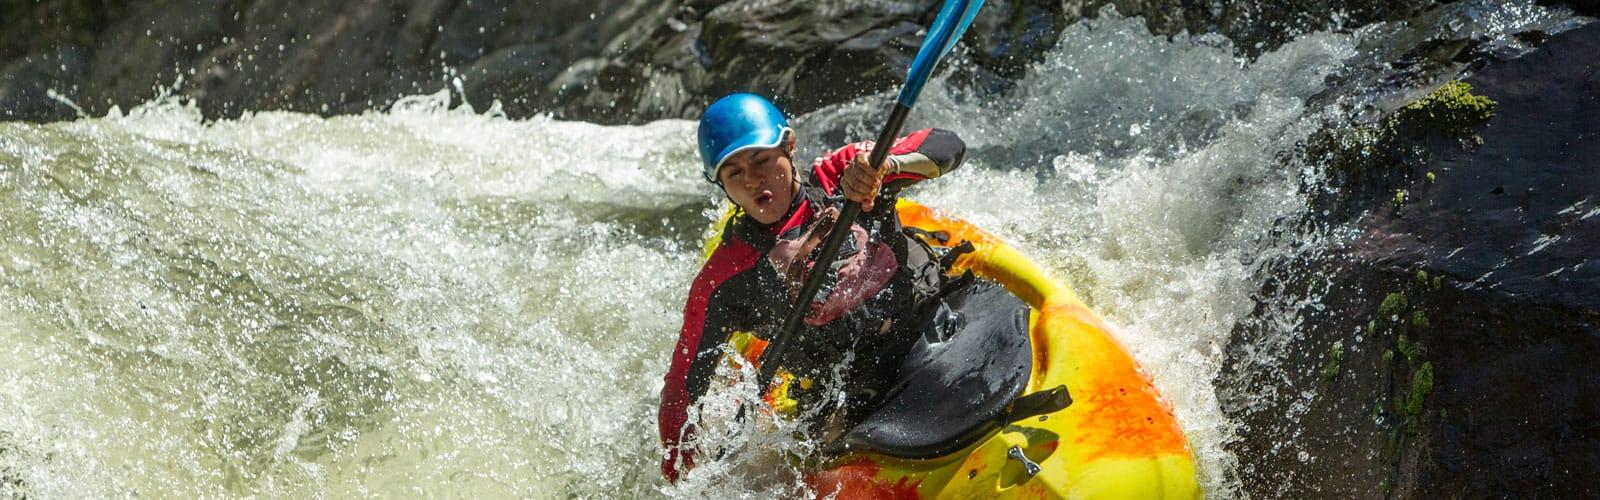 Kayak Jacket and Helmet